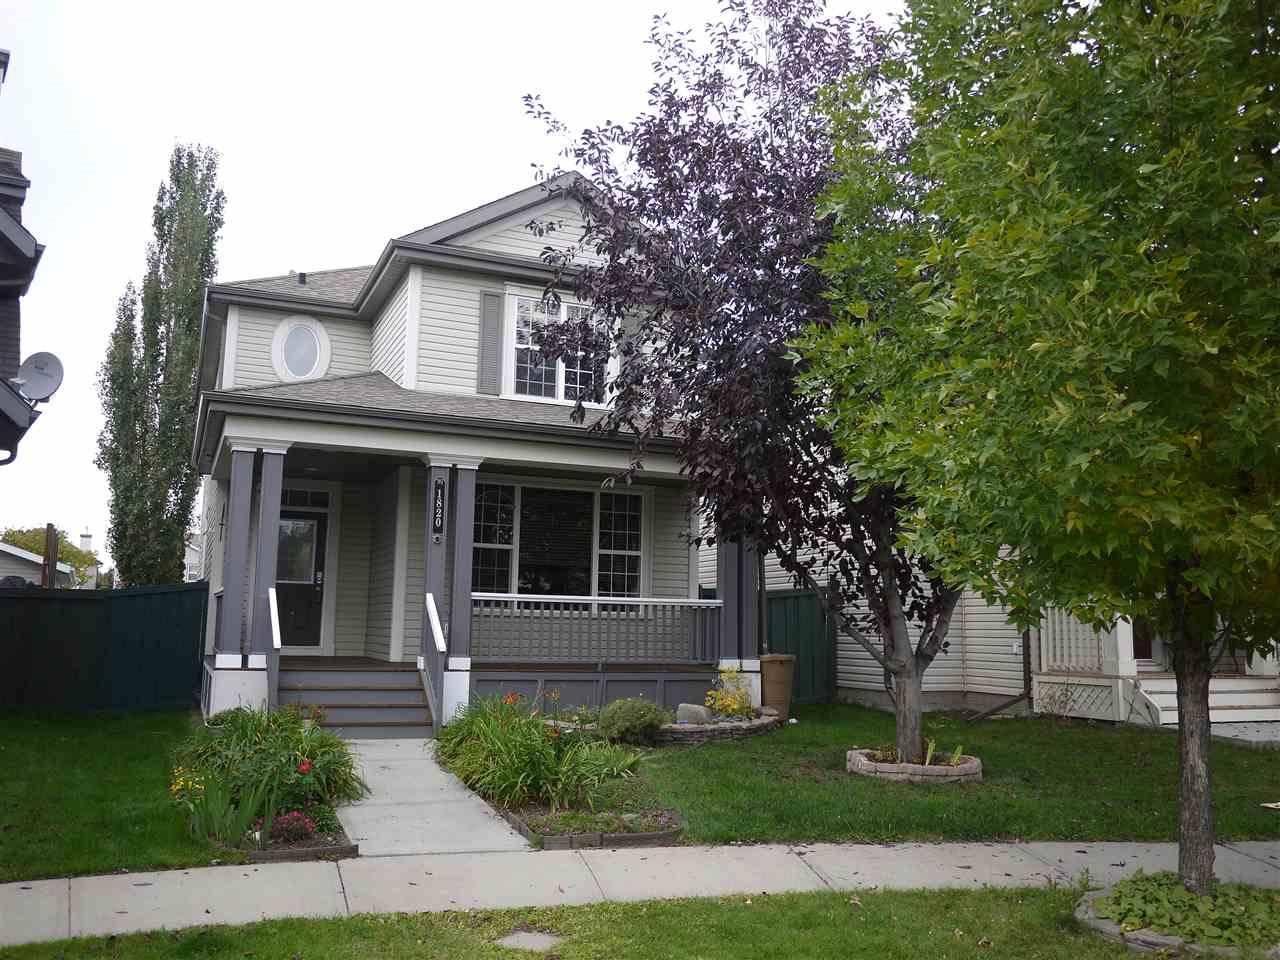 House for sale at 1820 121 St Sw Edmonton Alberta - MLS: E4174850